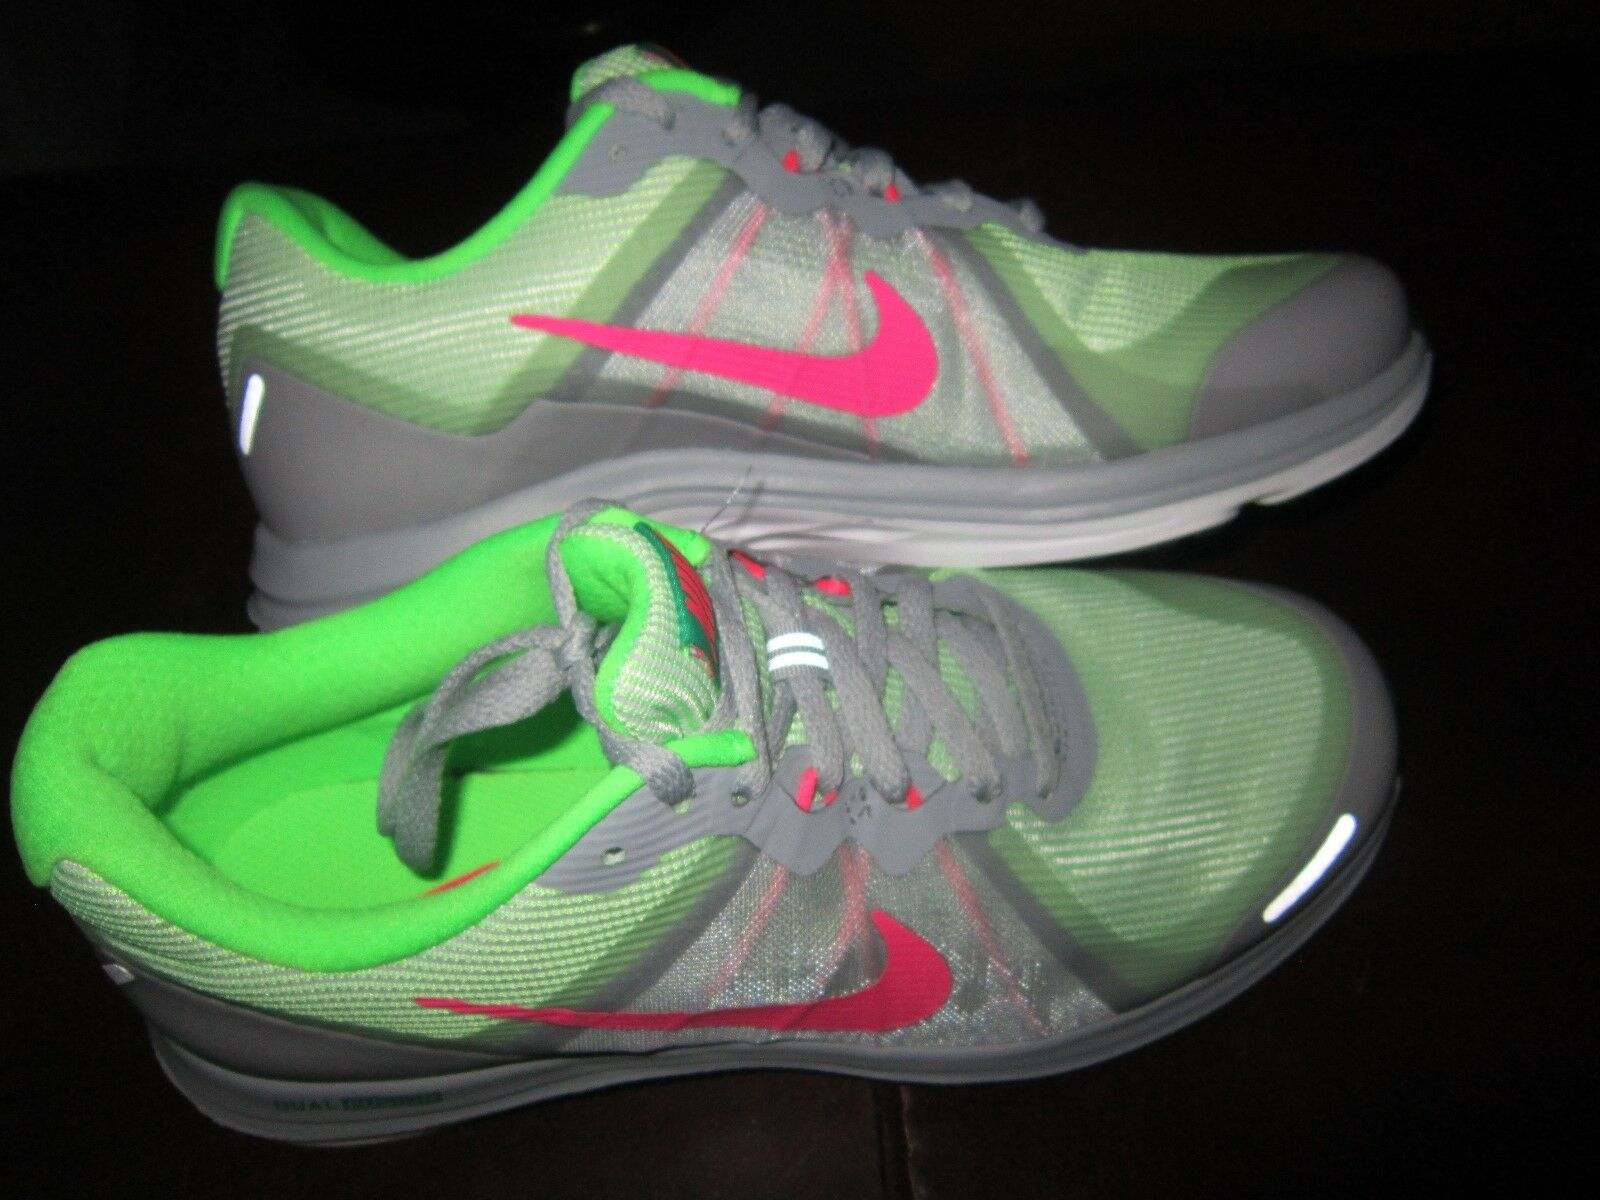 Nike Women's Size 7 Dual Fusion X 2 GrayVolt Pink Athletic Shoe; New w/o Box